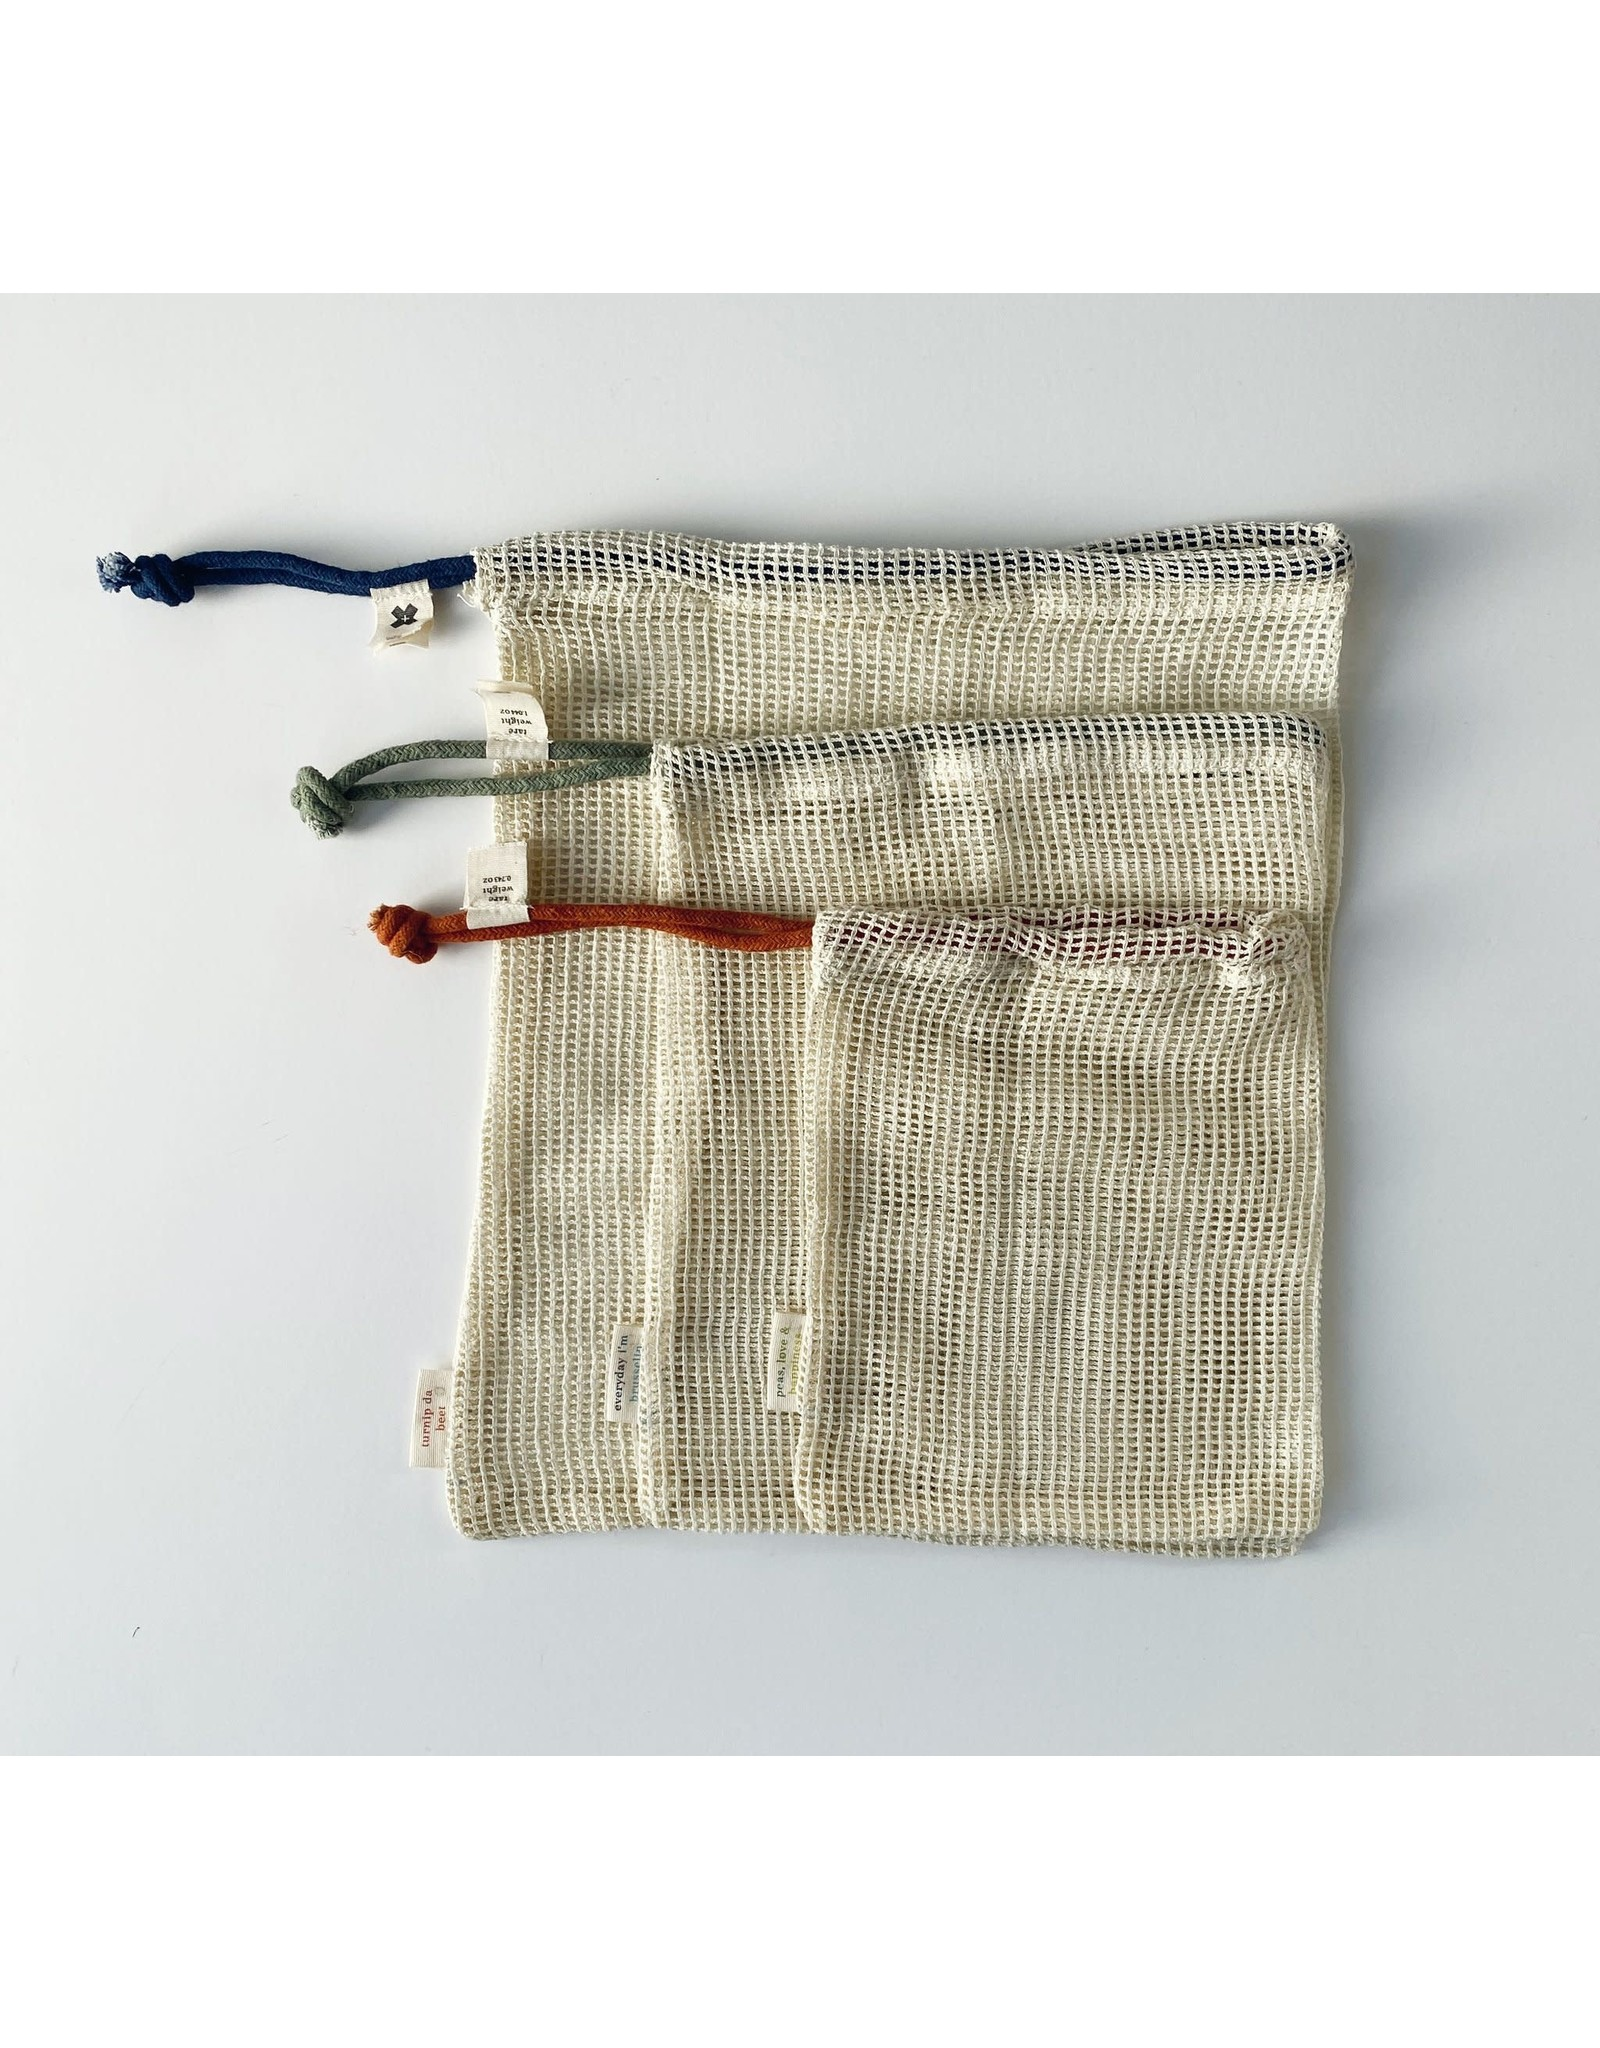 Ten & Co Produce Bag- Set of 3 Plus Zipped Pouch